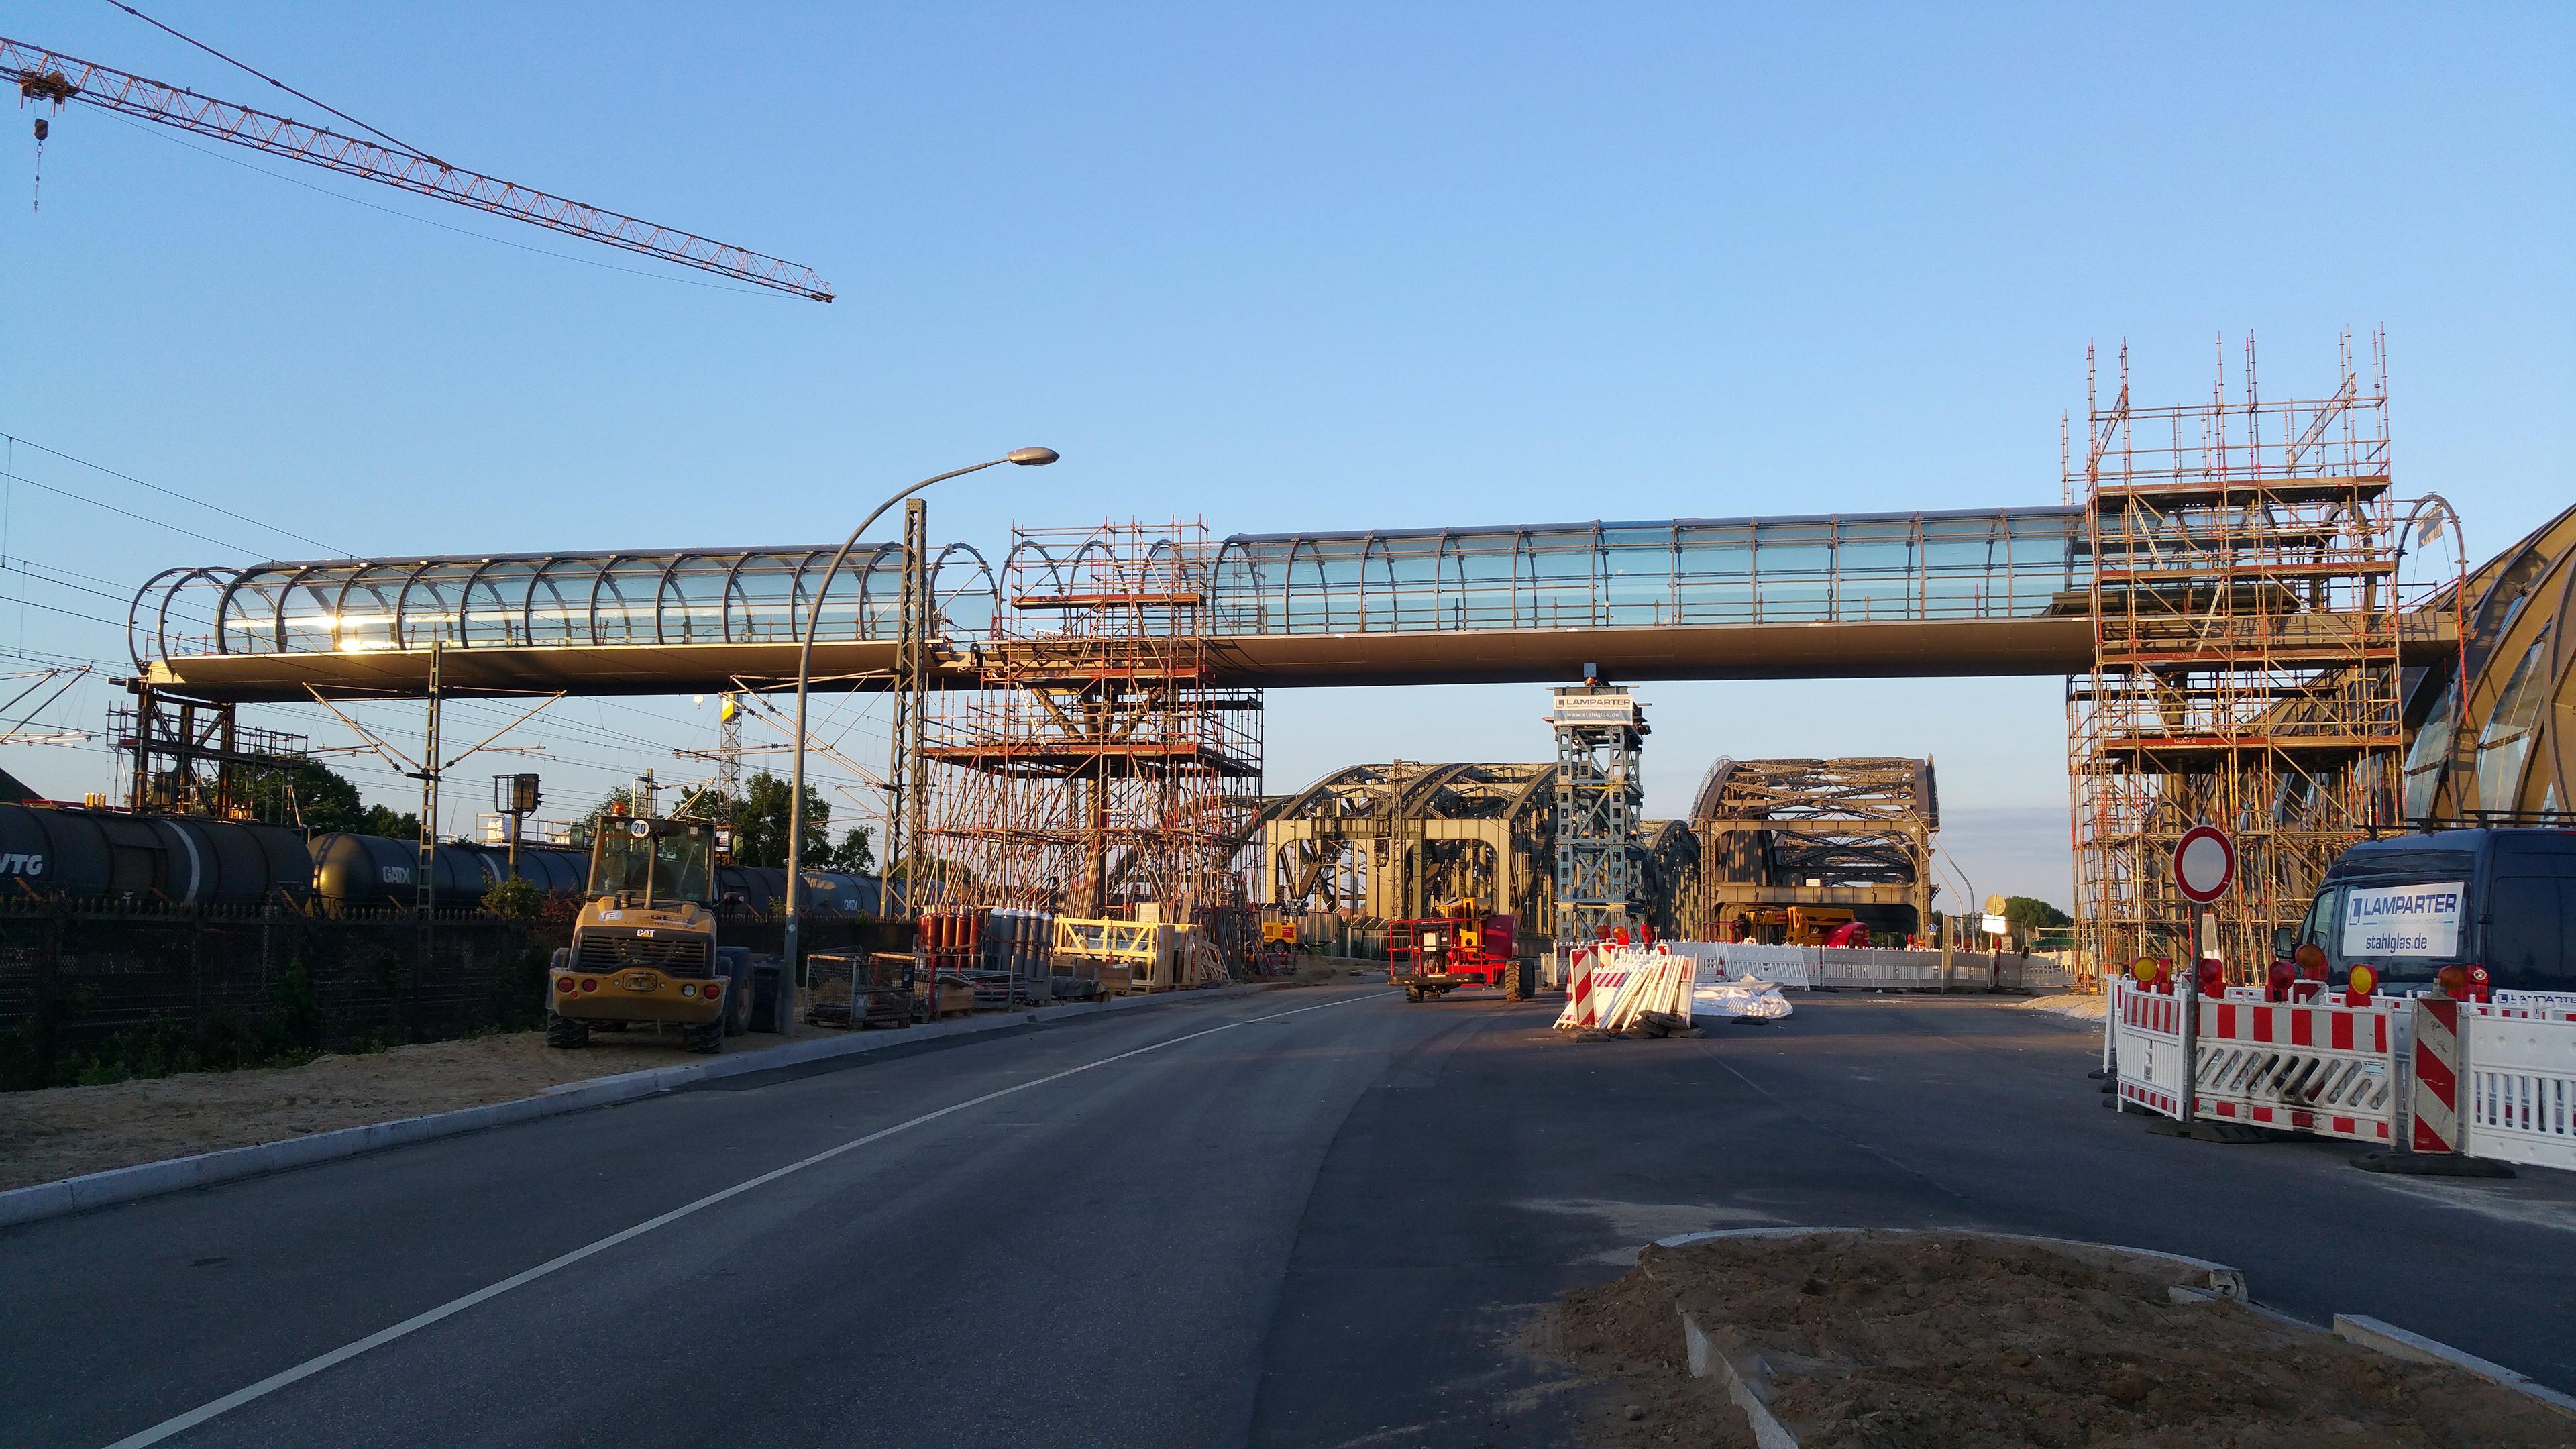 Hamburg Hochbahn Skywalk Brücke